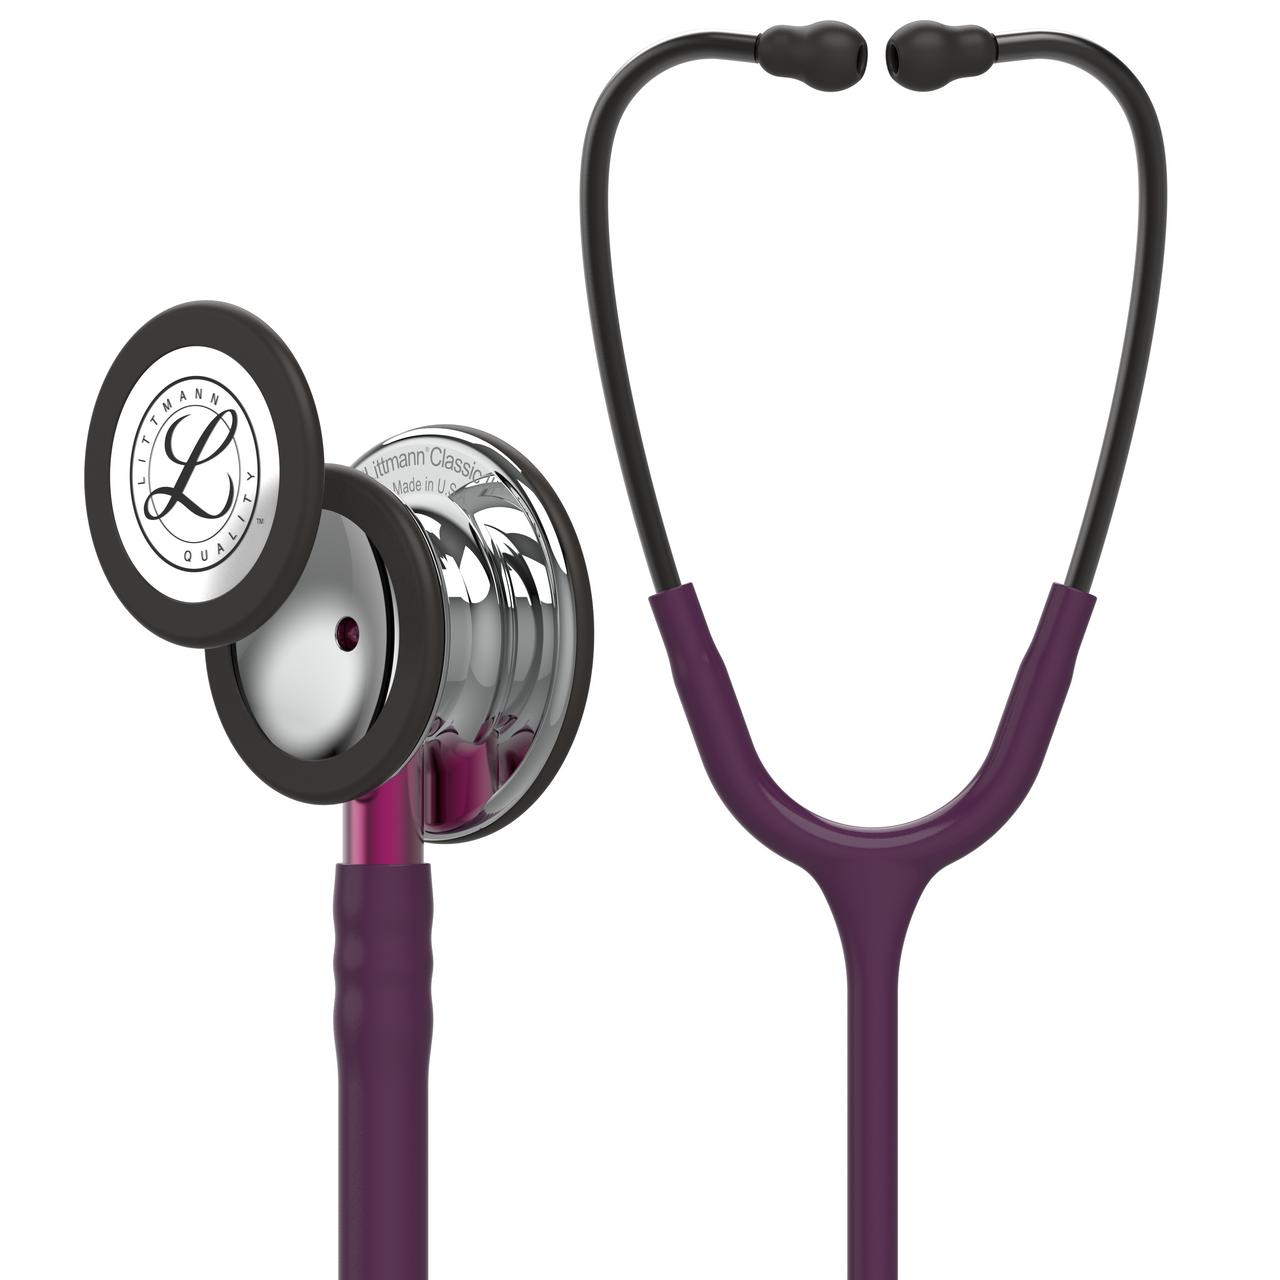 Littmann Classic III Stethoscope, Mirror Plum Pink, 5960